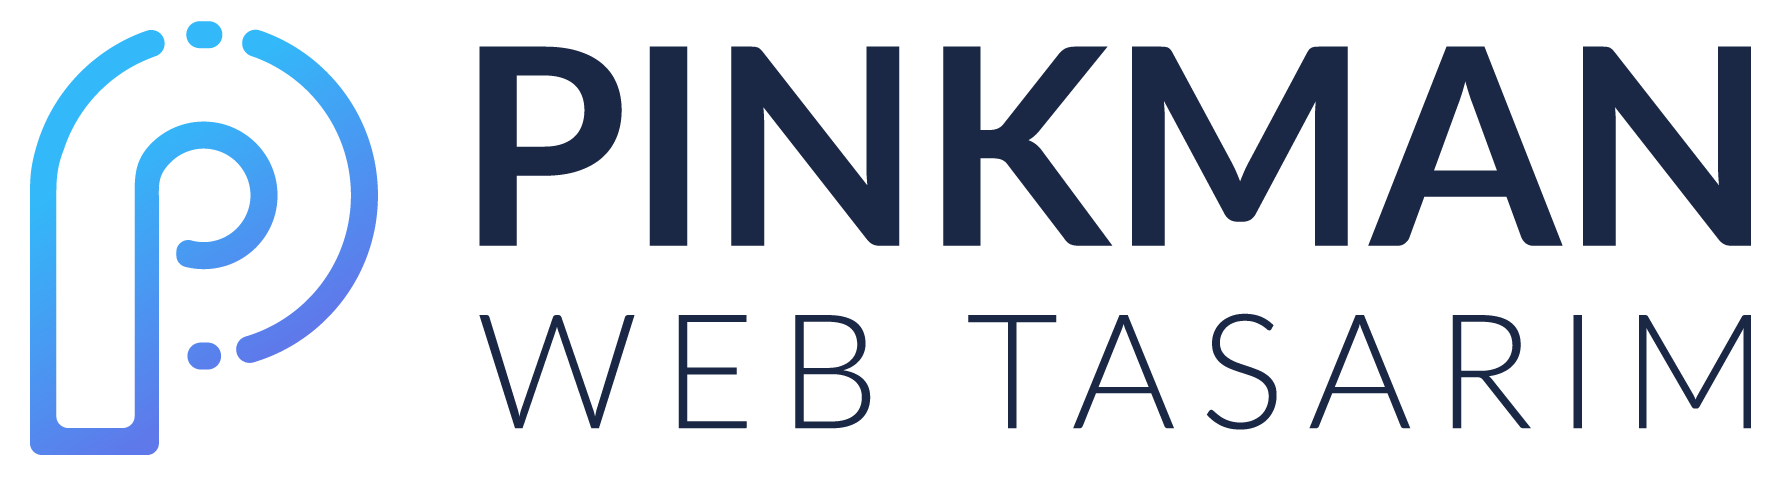 pinkman_logo-04